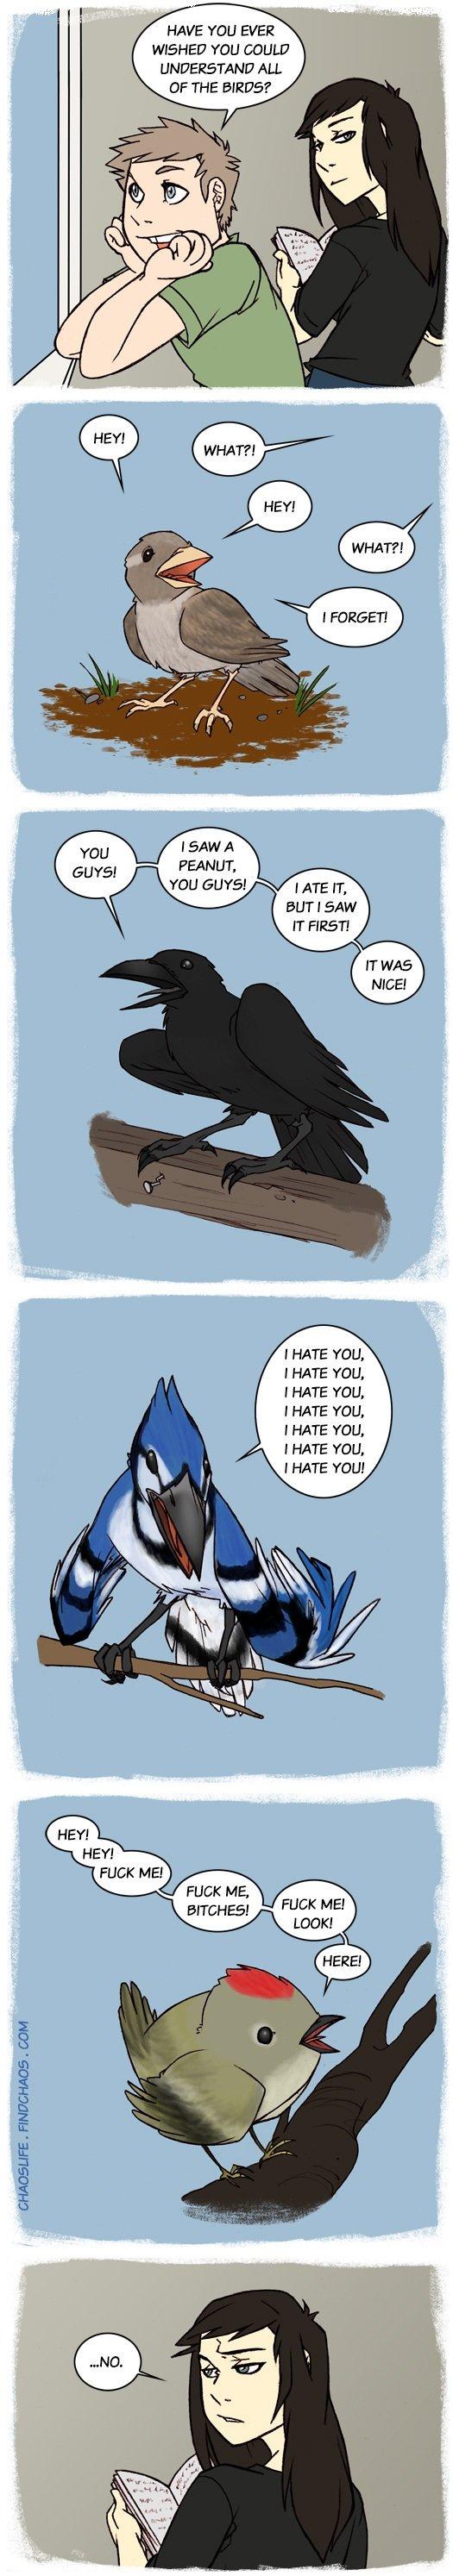 "Birds. . FINES"" -HADA . GUM HAVE Y' EVER? WISHED TDD All OF THE ? I SAN A PEANUT, I ATE IT, BUT I SAW I HATE fold, I HATE YOU, I HATE YOU, I HATE YOU, I HATE TH"